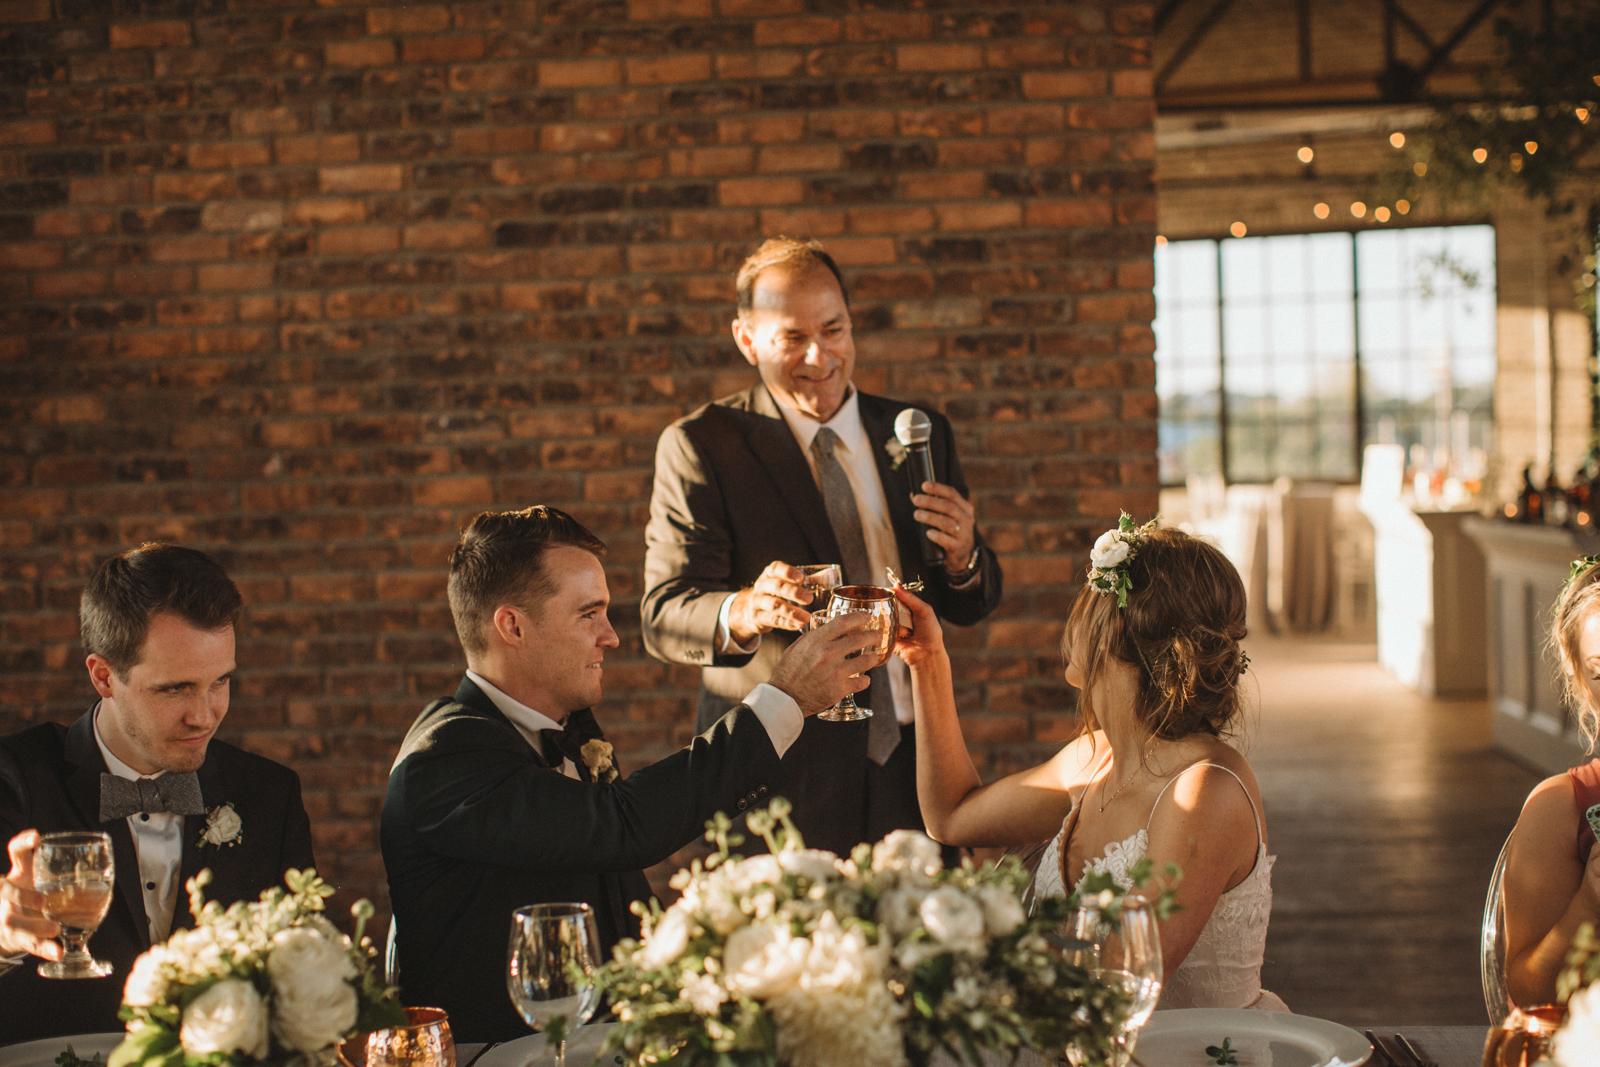 BeanandCole.com-Chris&JackieJohnson-Wedding-242.jpg